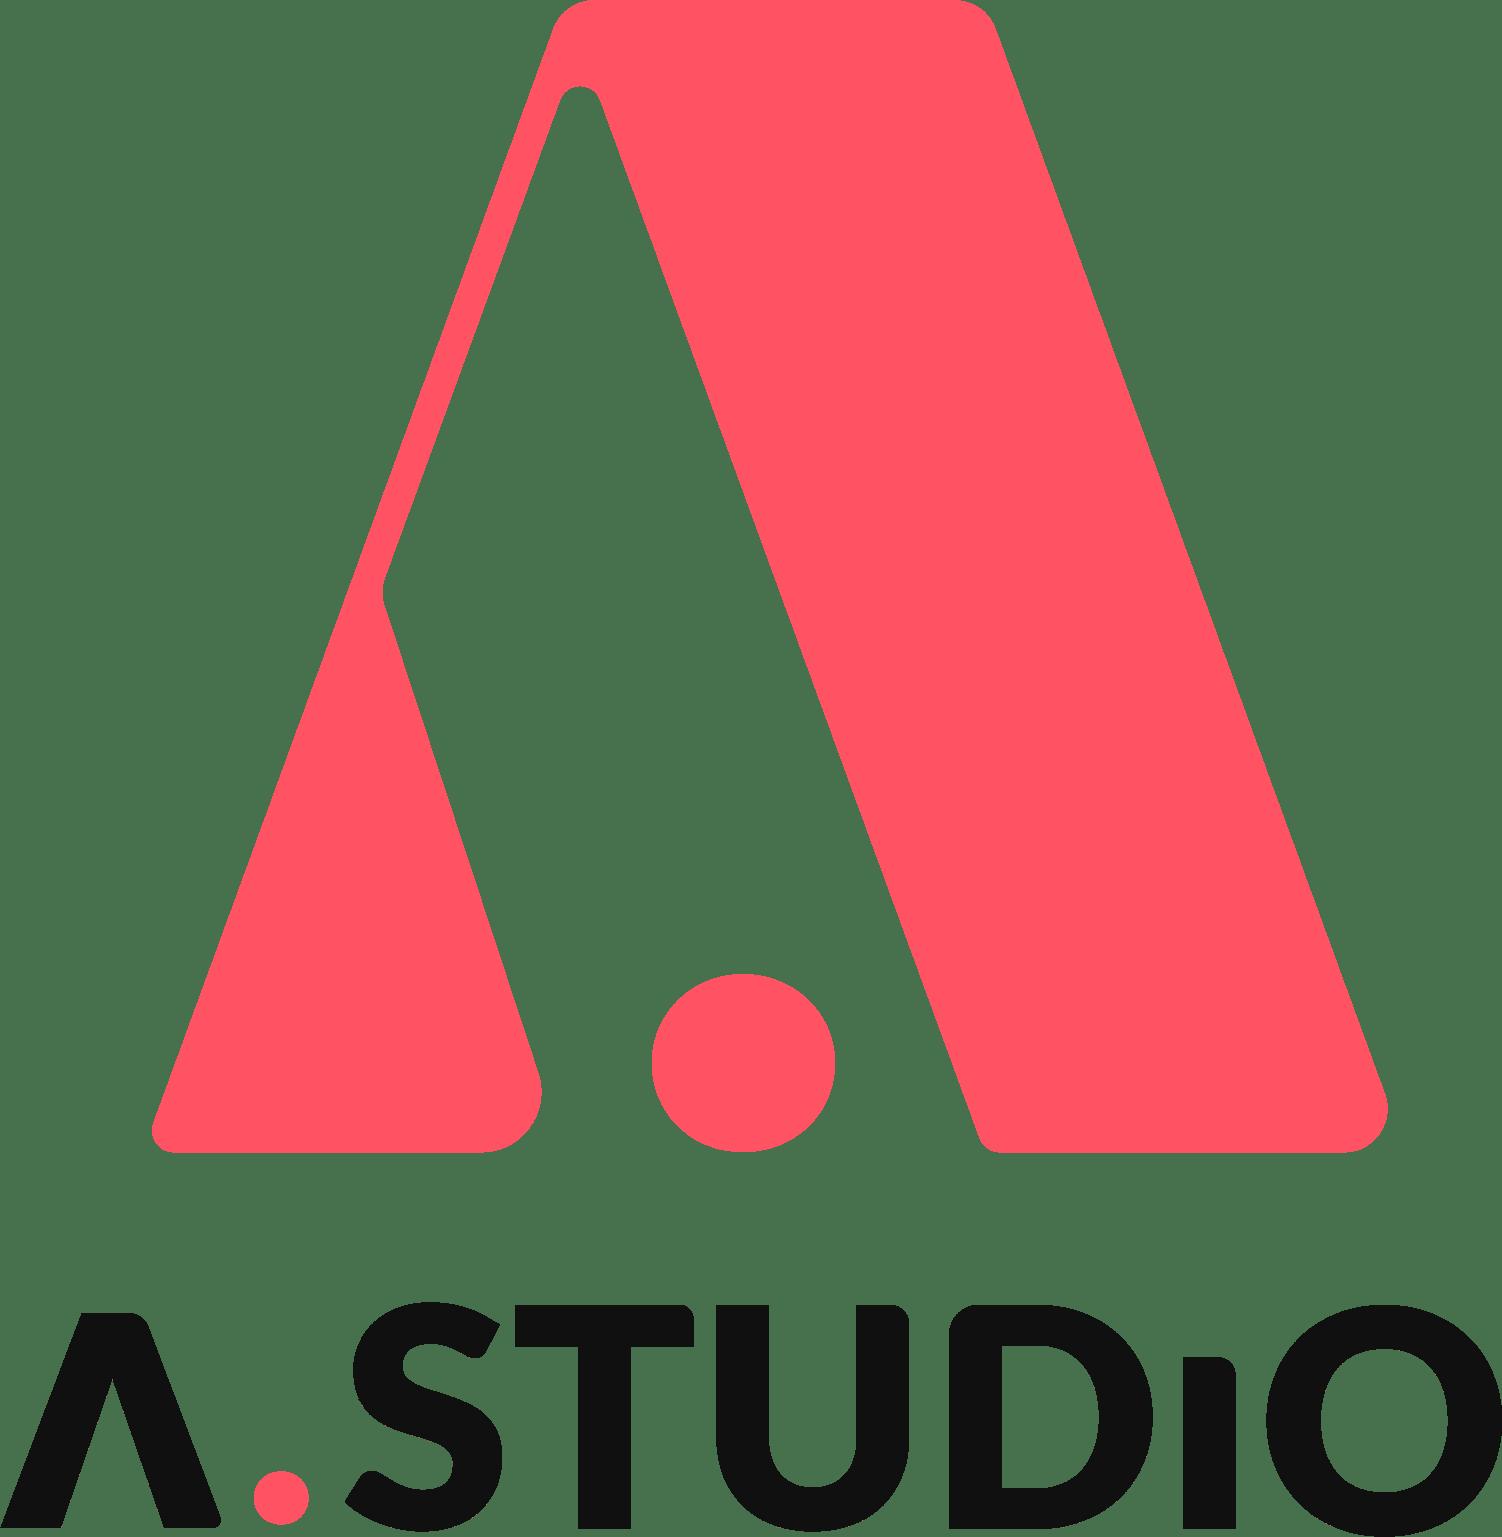 A.STUDIO